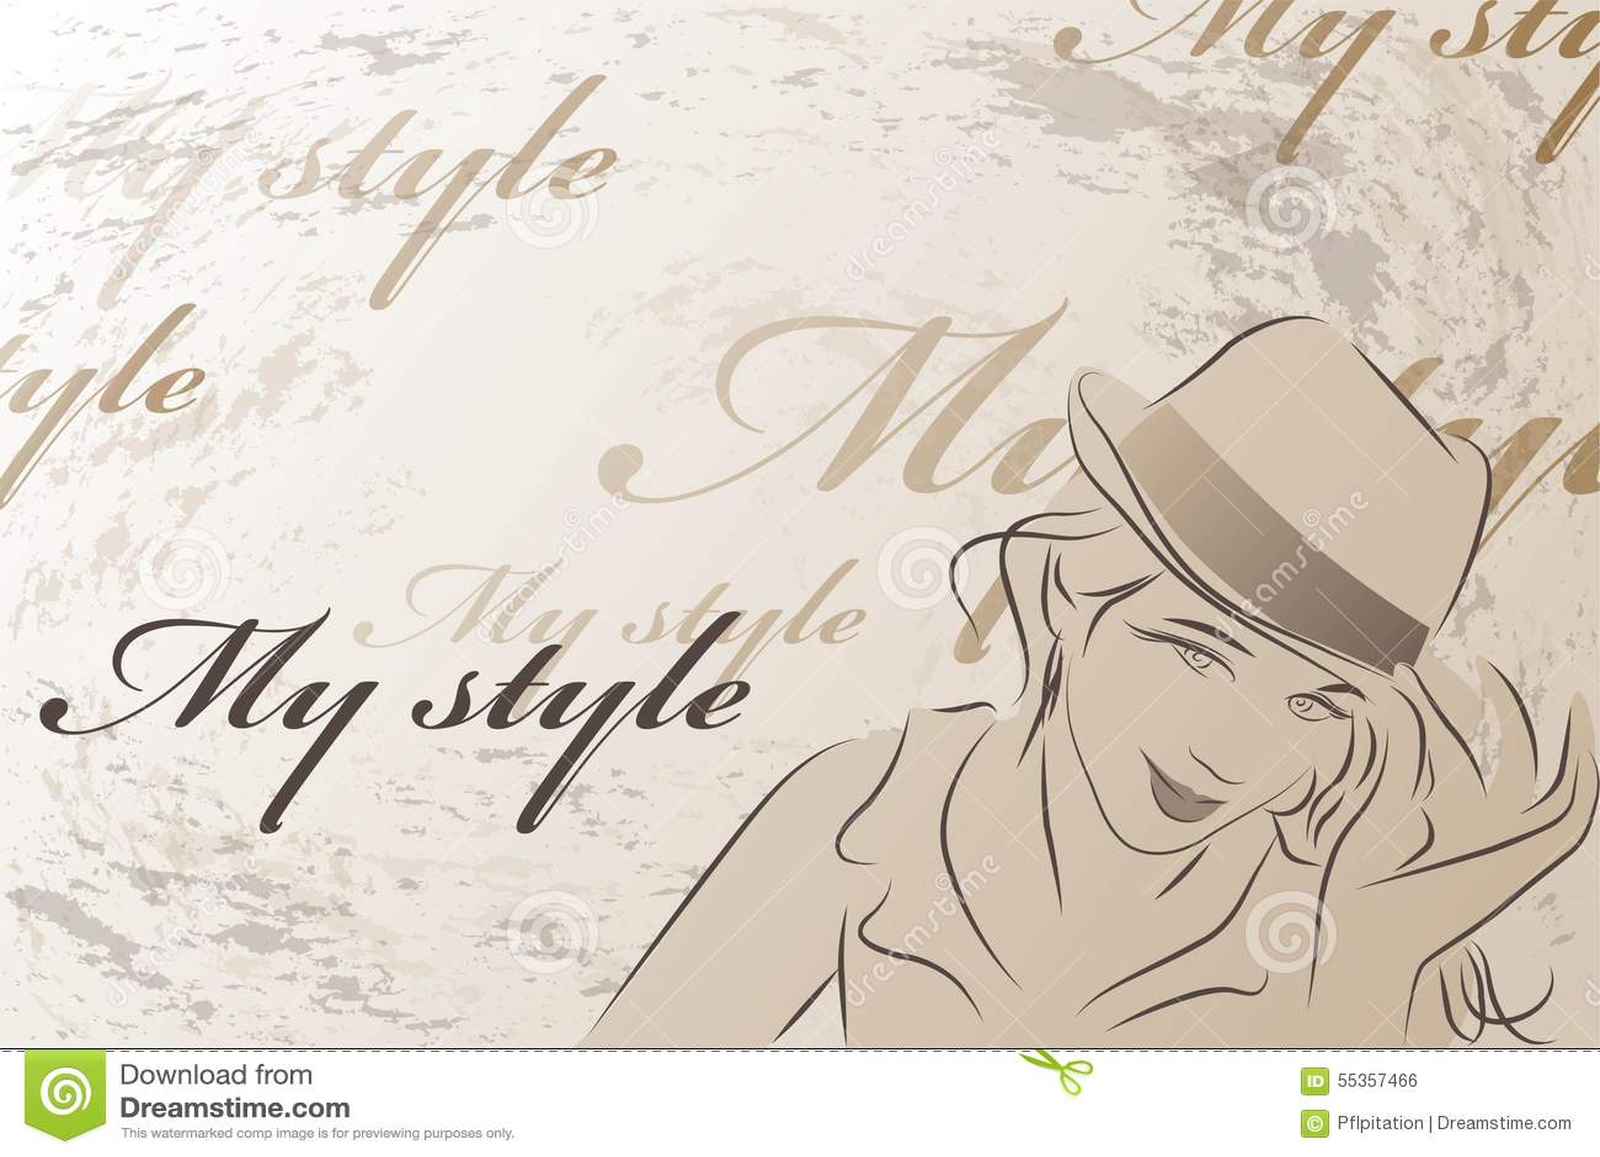 Il mio stile